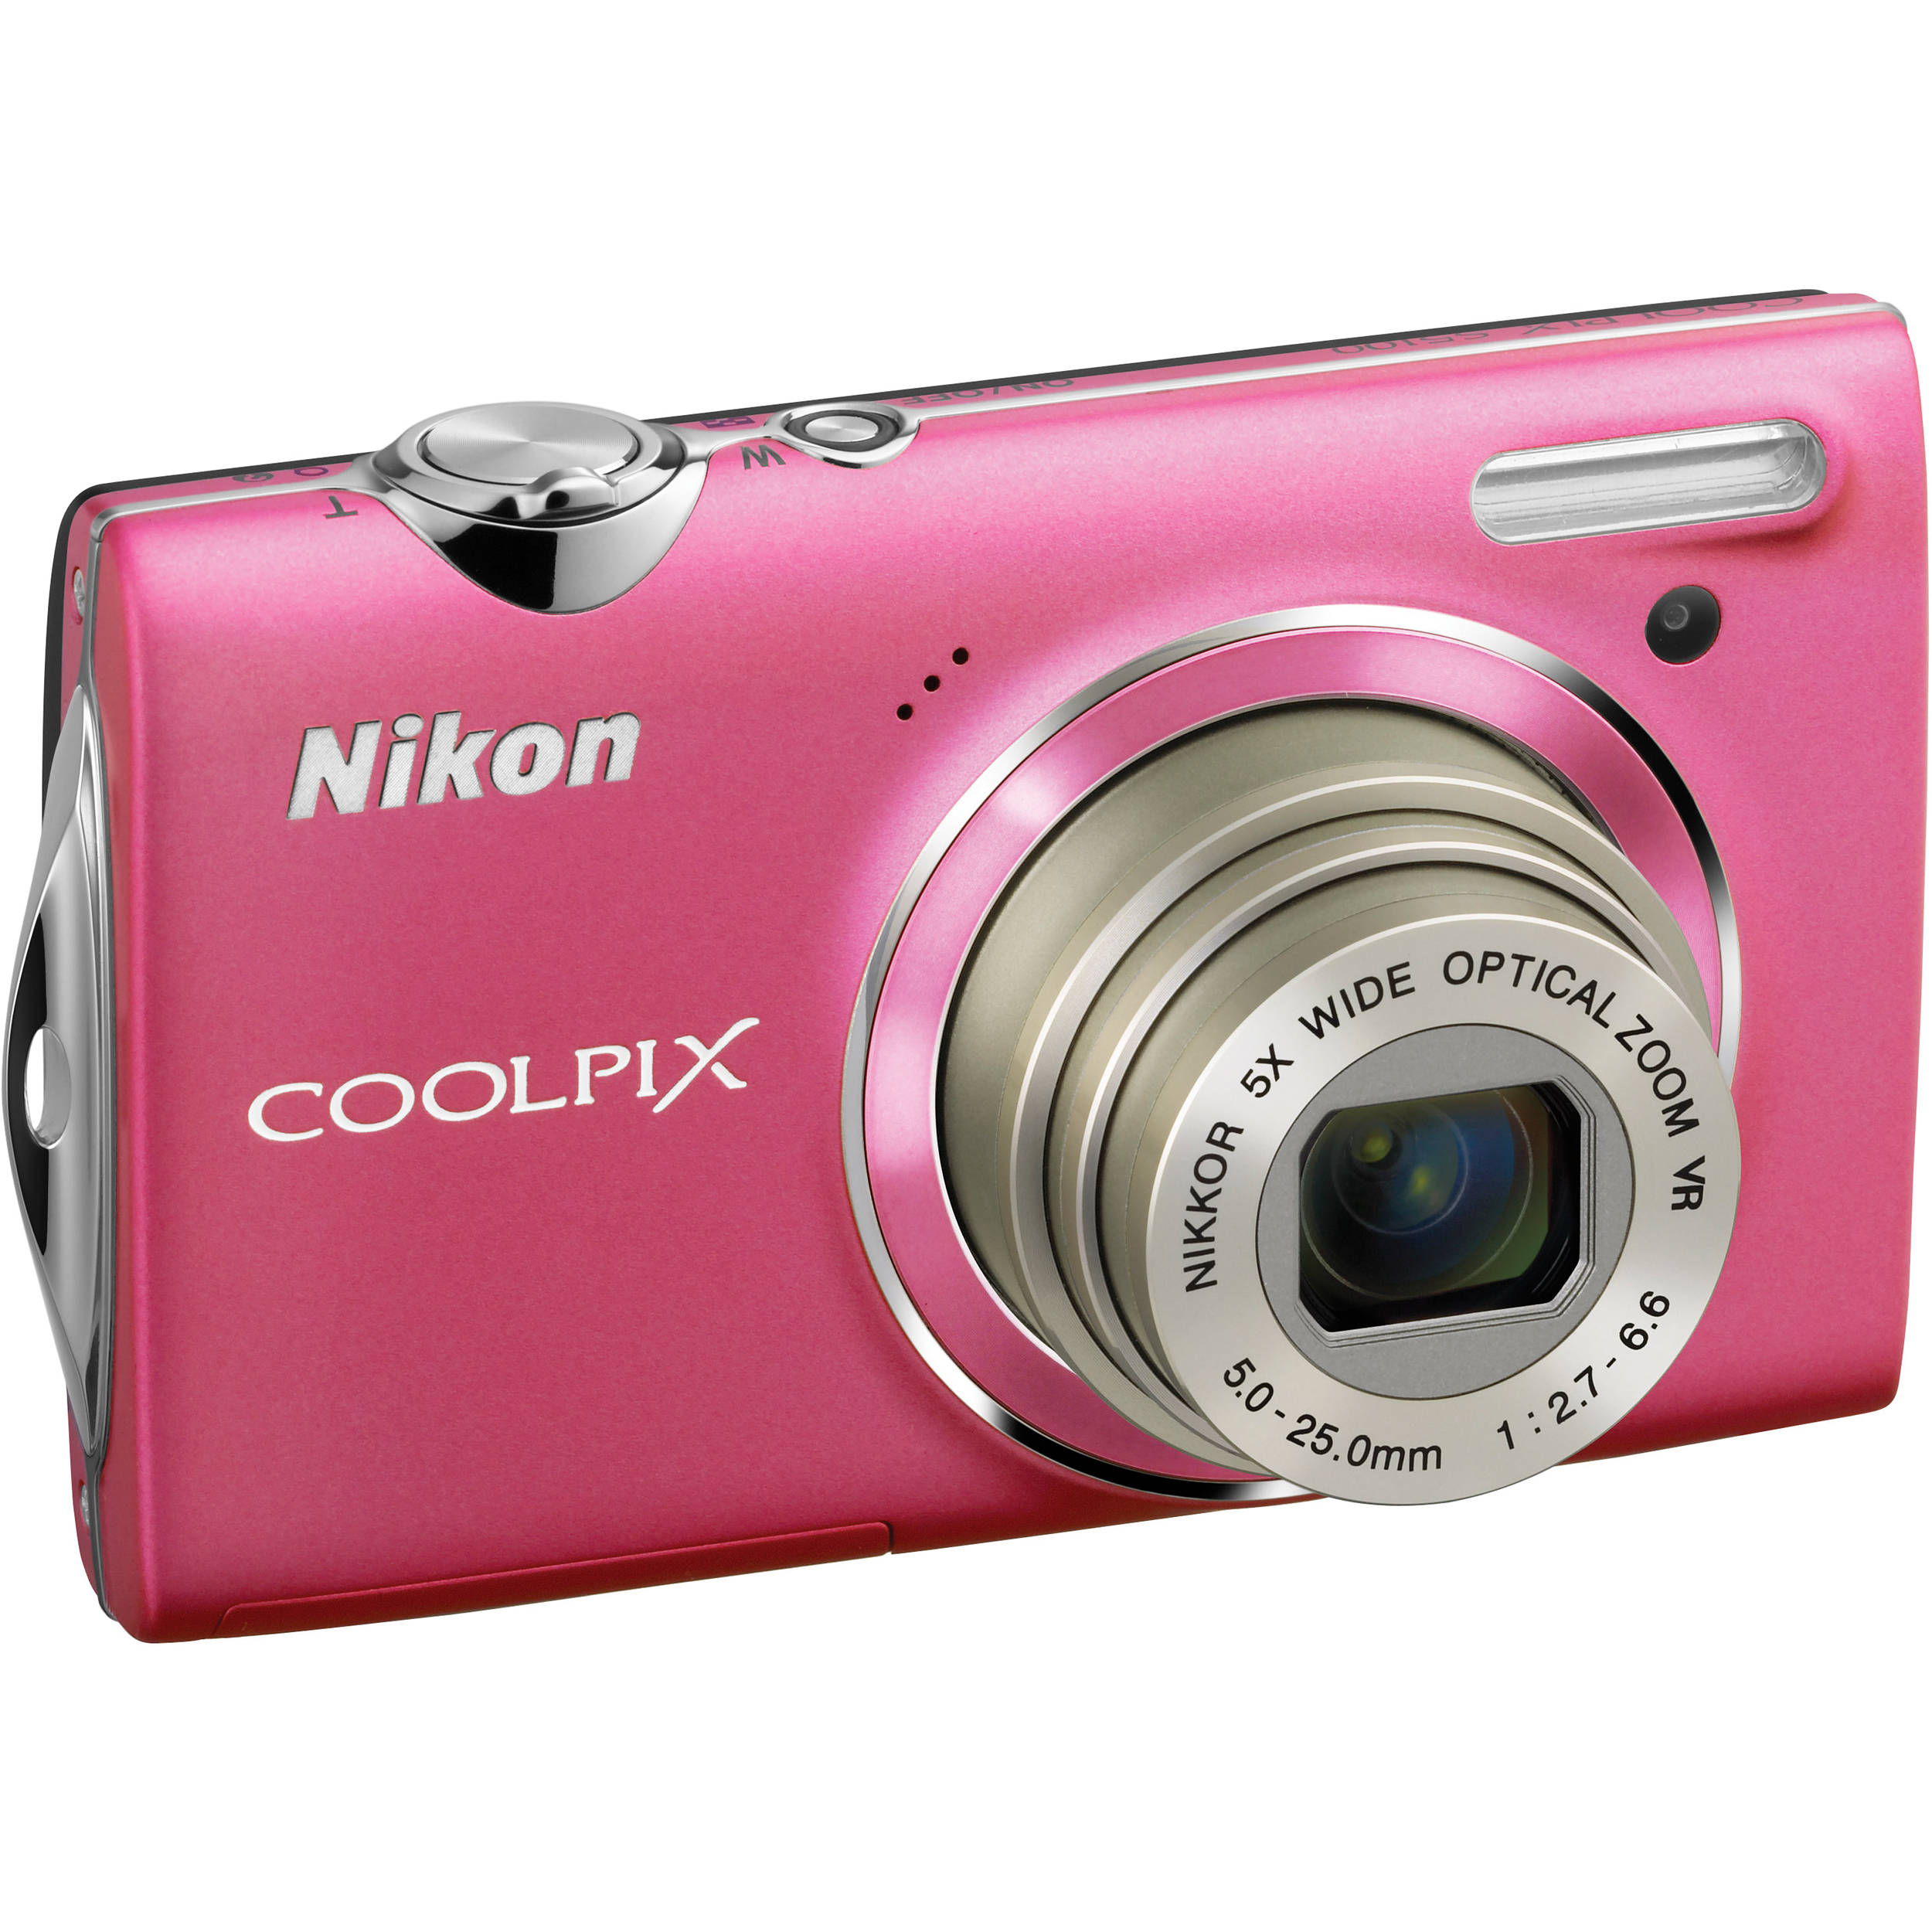 Nikon CoolPix S5100 Compact Digital Camera (Pink) 26223 B&H